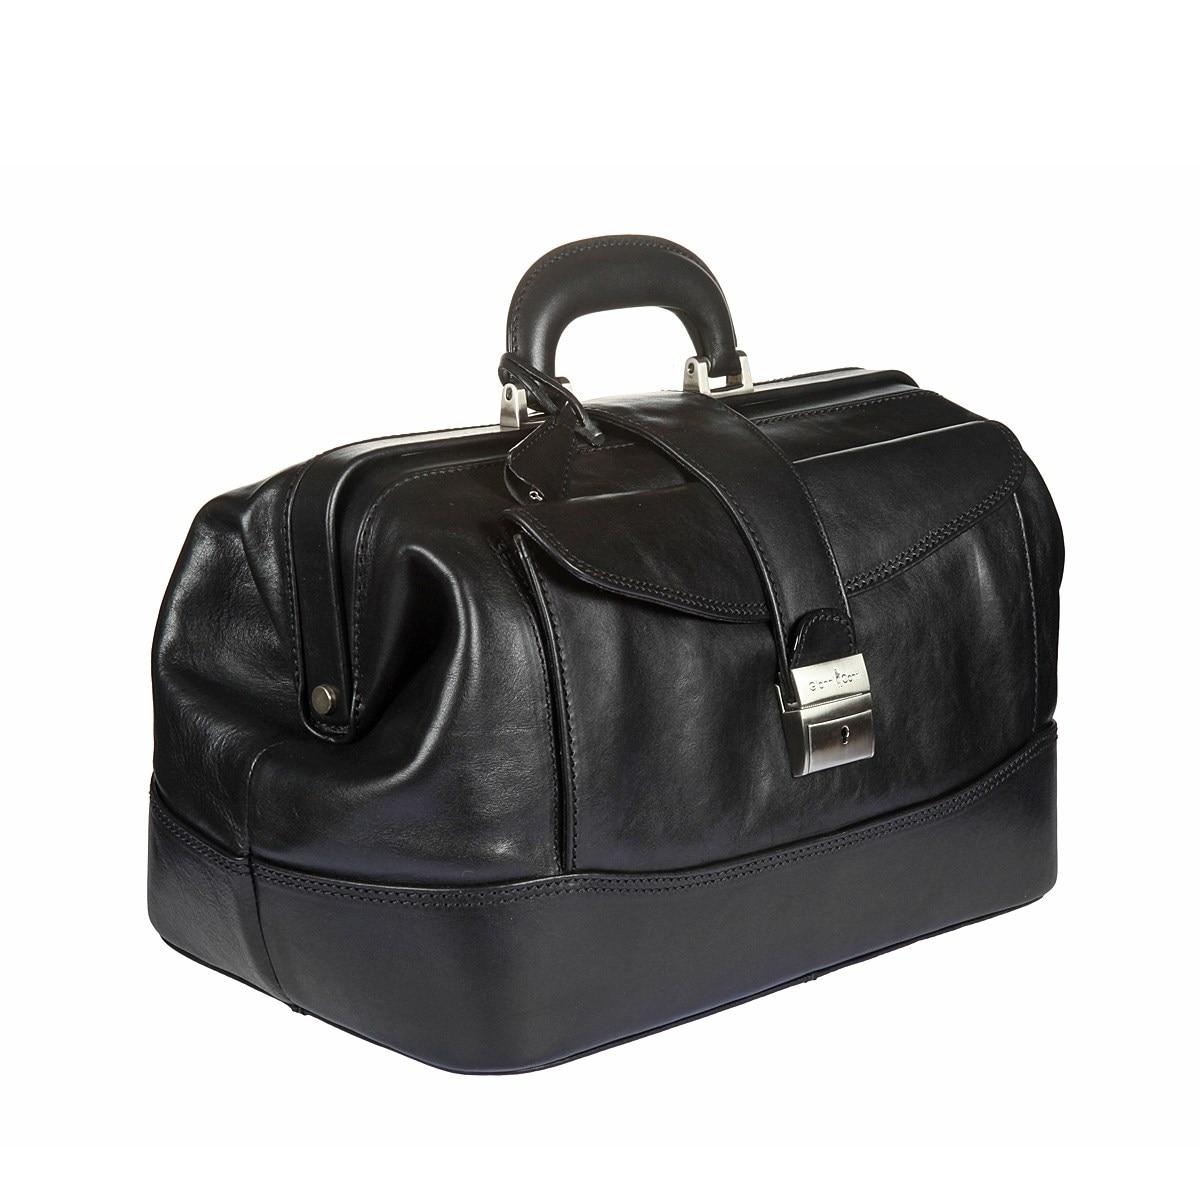 Фото - Traveling Bag Gianni Conti 9401094 black cow leather tote bag brand 2018 bolsa feminina new women handbag 100% genuine leather alligator shoulder bag free shipping